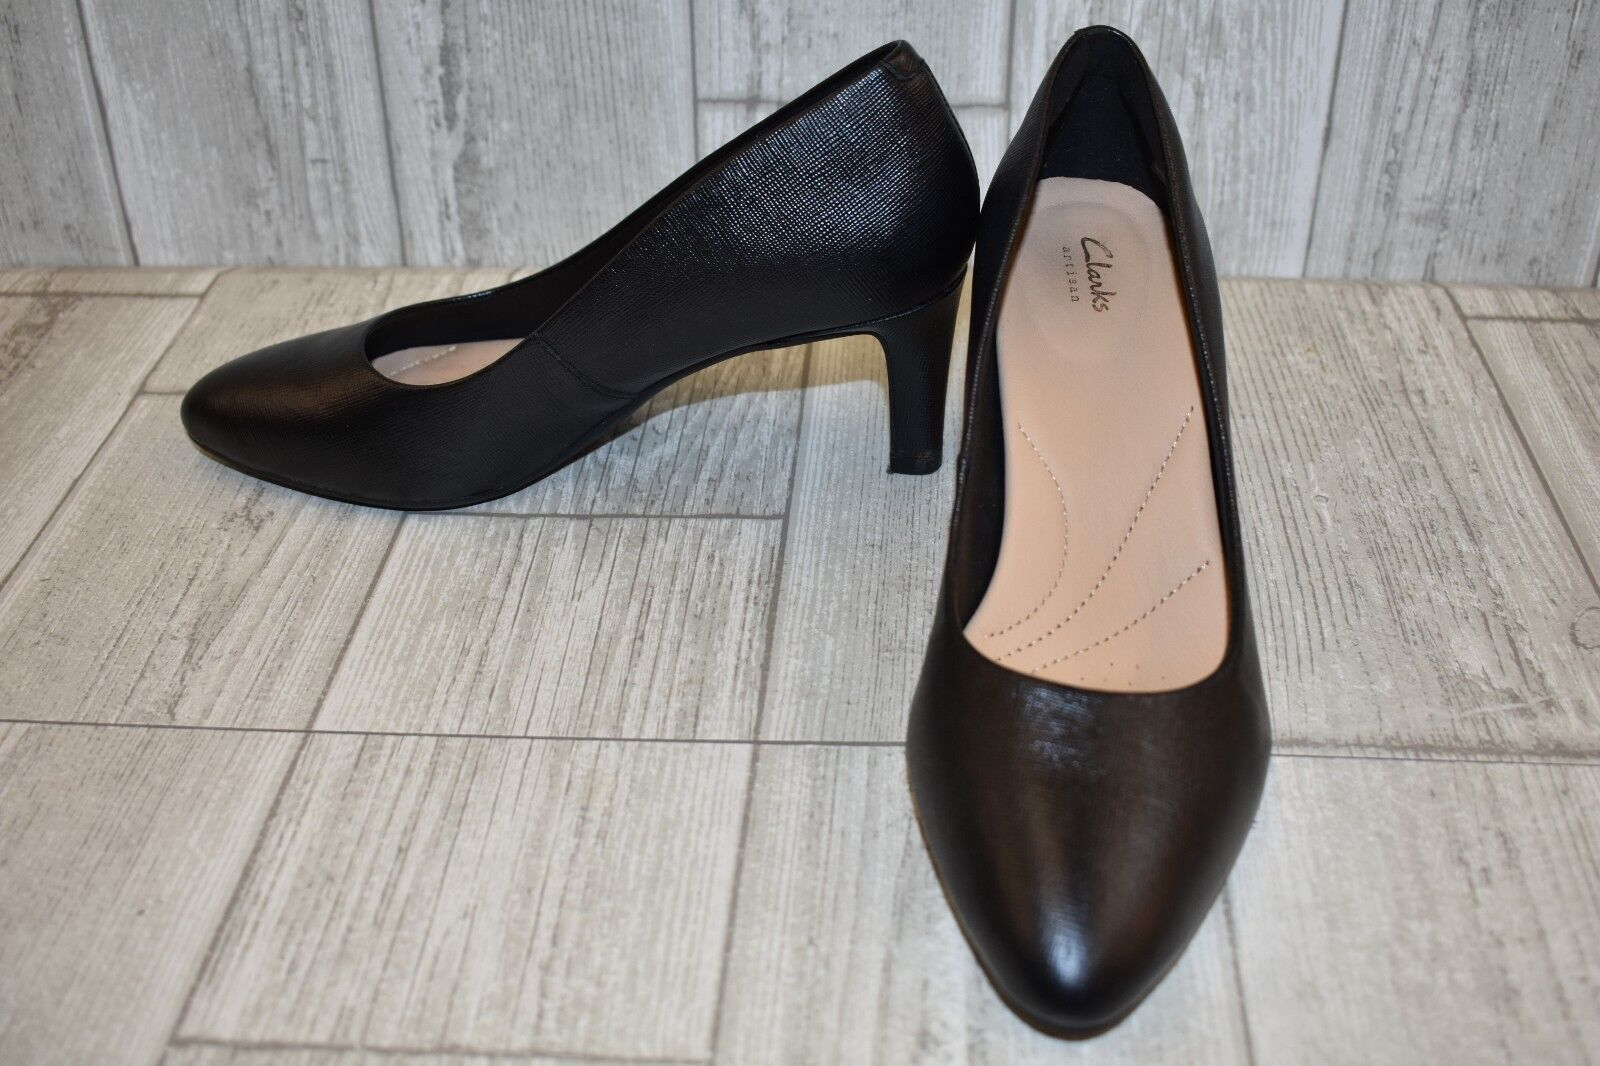 fd6019c0901d Buy Clarks Calla Rose Textured Leather PUMPS Women s Size 5m Black ...